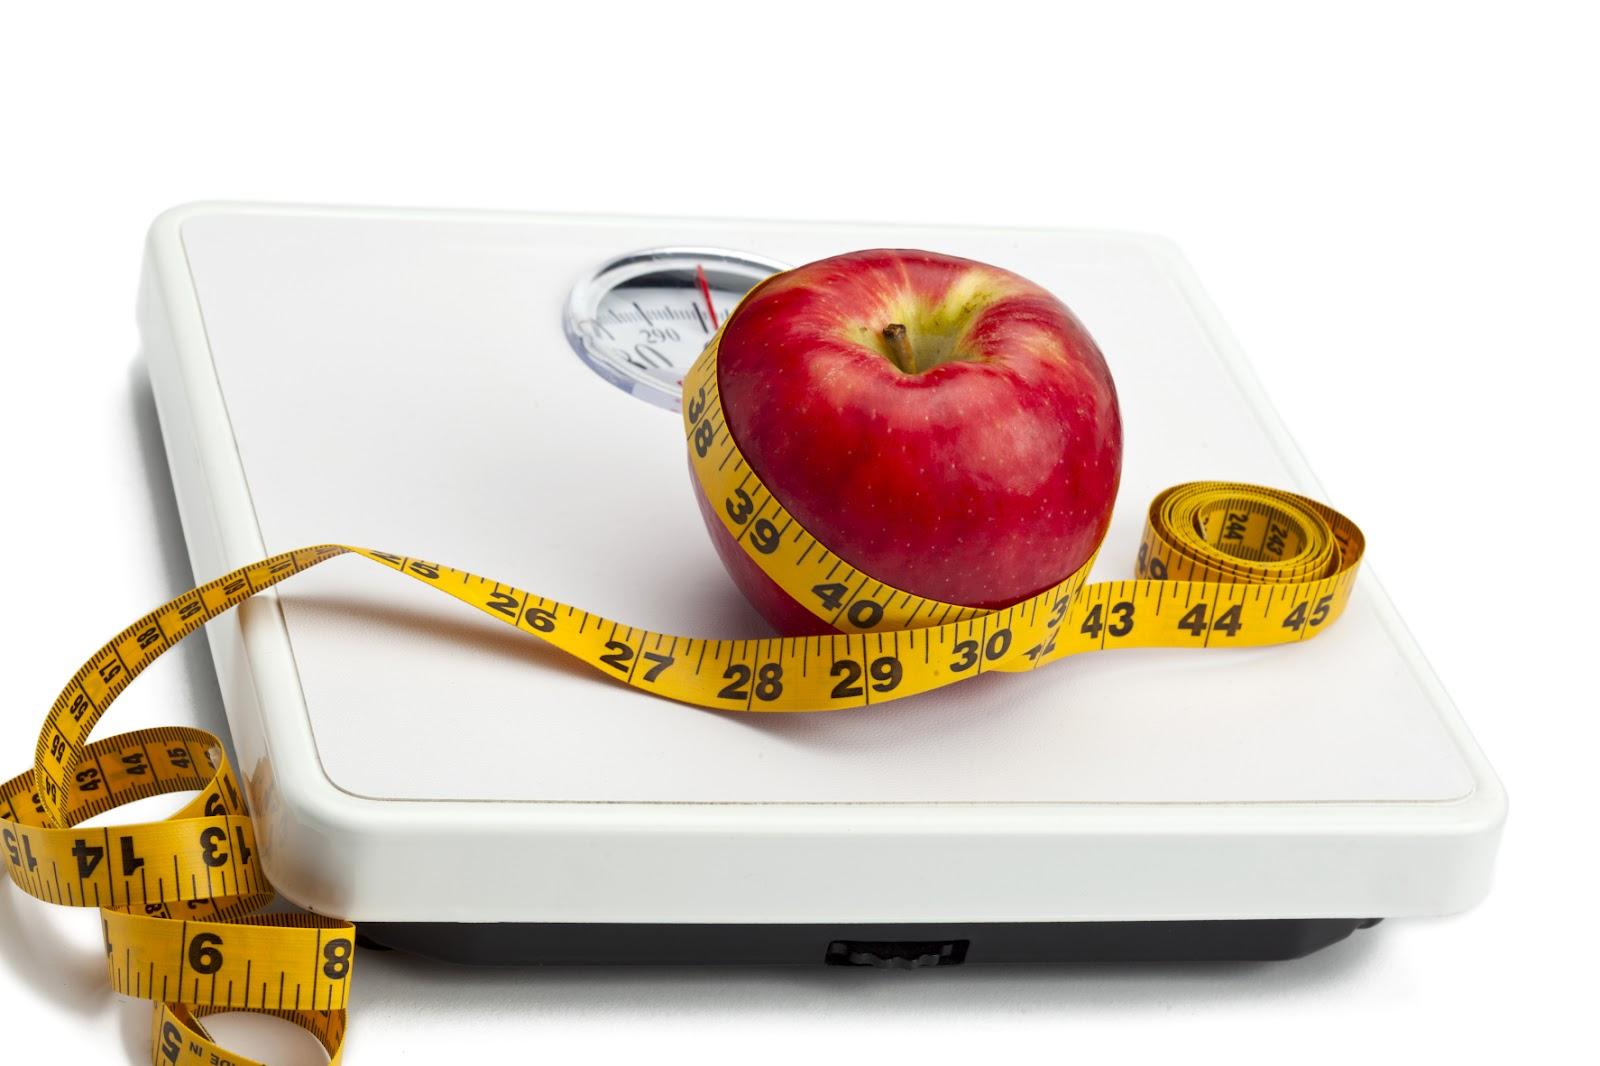 начинающий контроль за весом картинки каким правилам